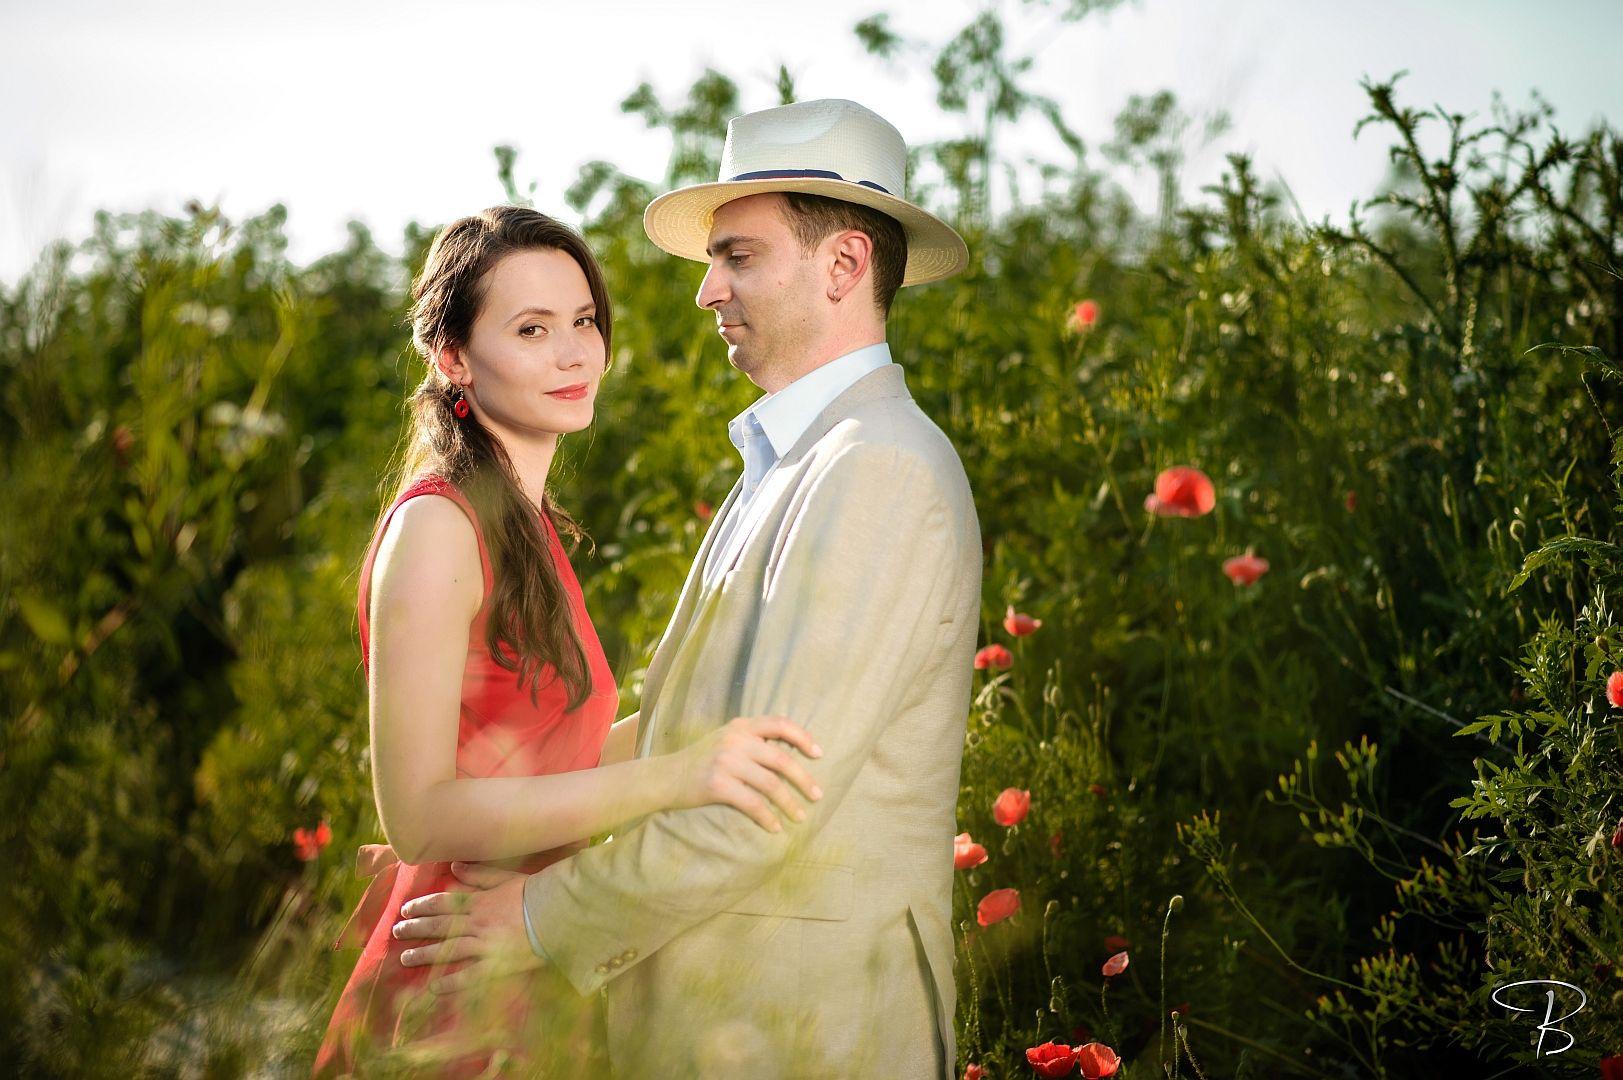 Letitia & Cosmin by Bogdan Terente http://bogdanterente.ro